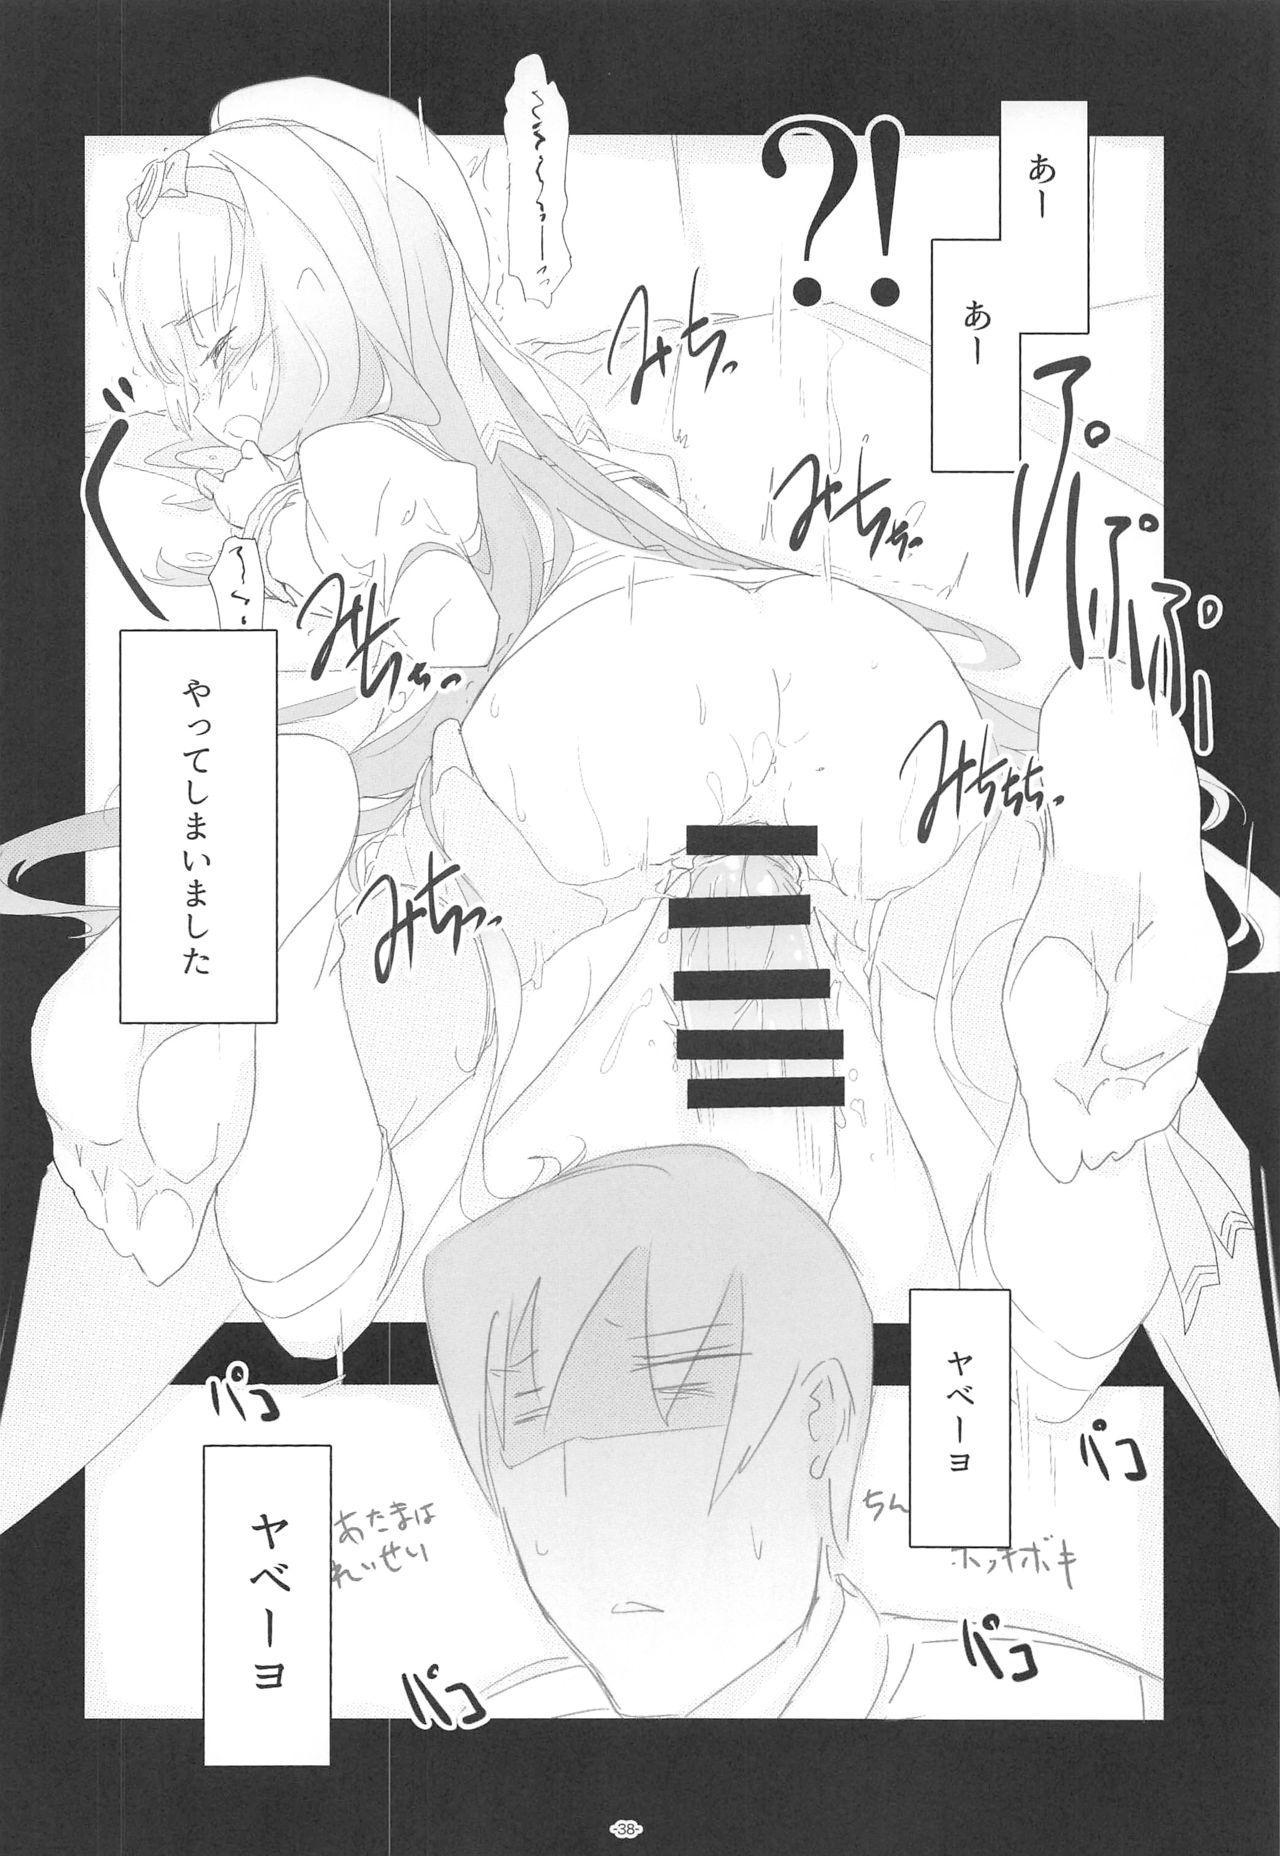 Korokoro-Manman II Korokoro:P Soushuuhen II 36